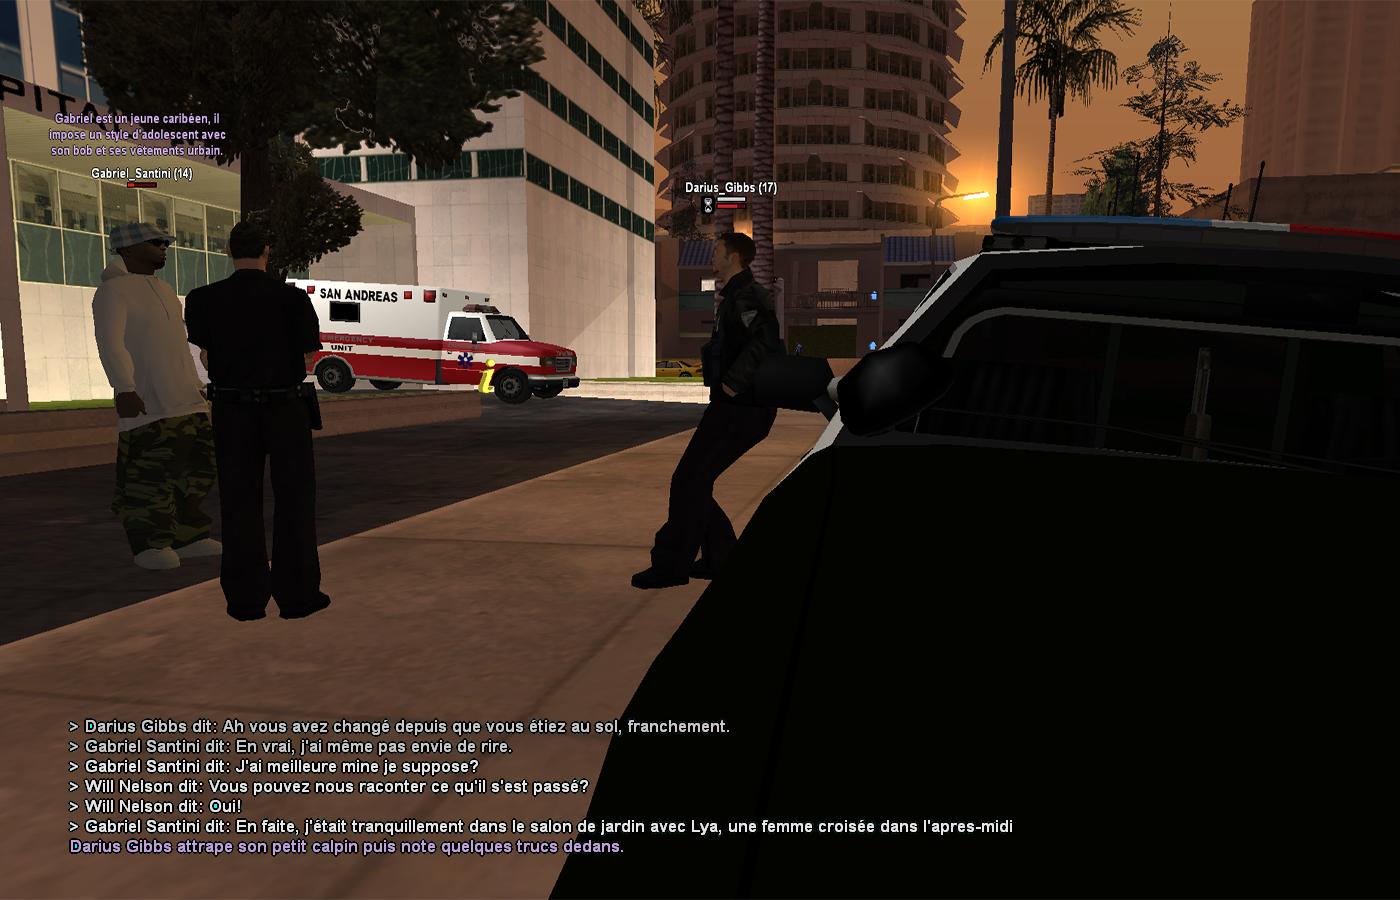 Los Santos Police Département #toprotectandtoserve (Part VI) - Page 3 1604274878-screen3